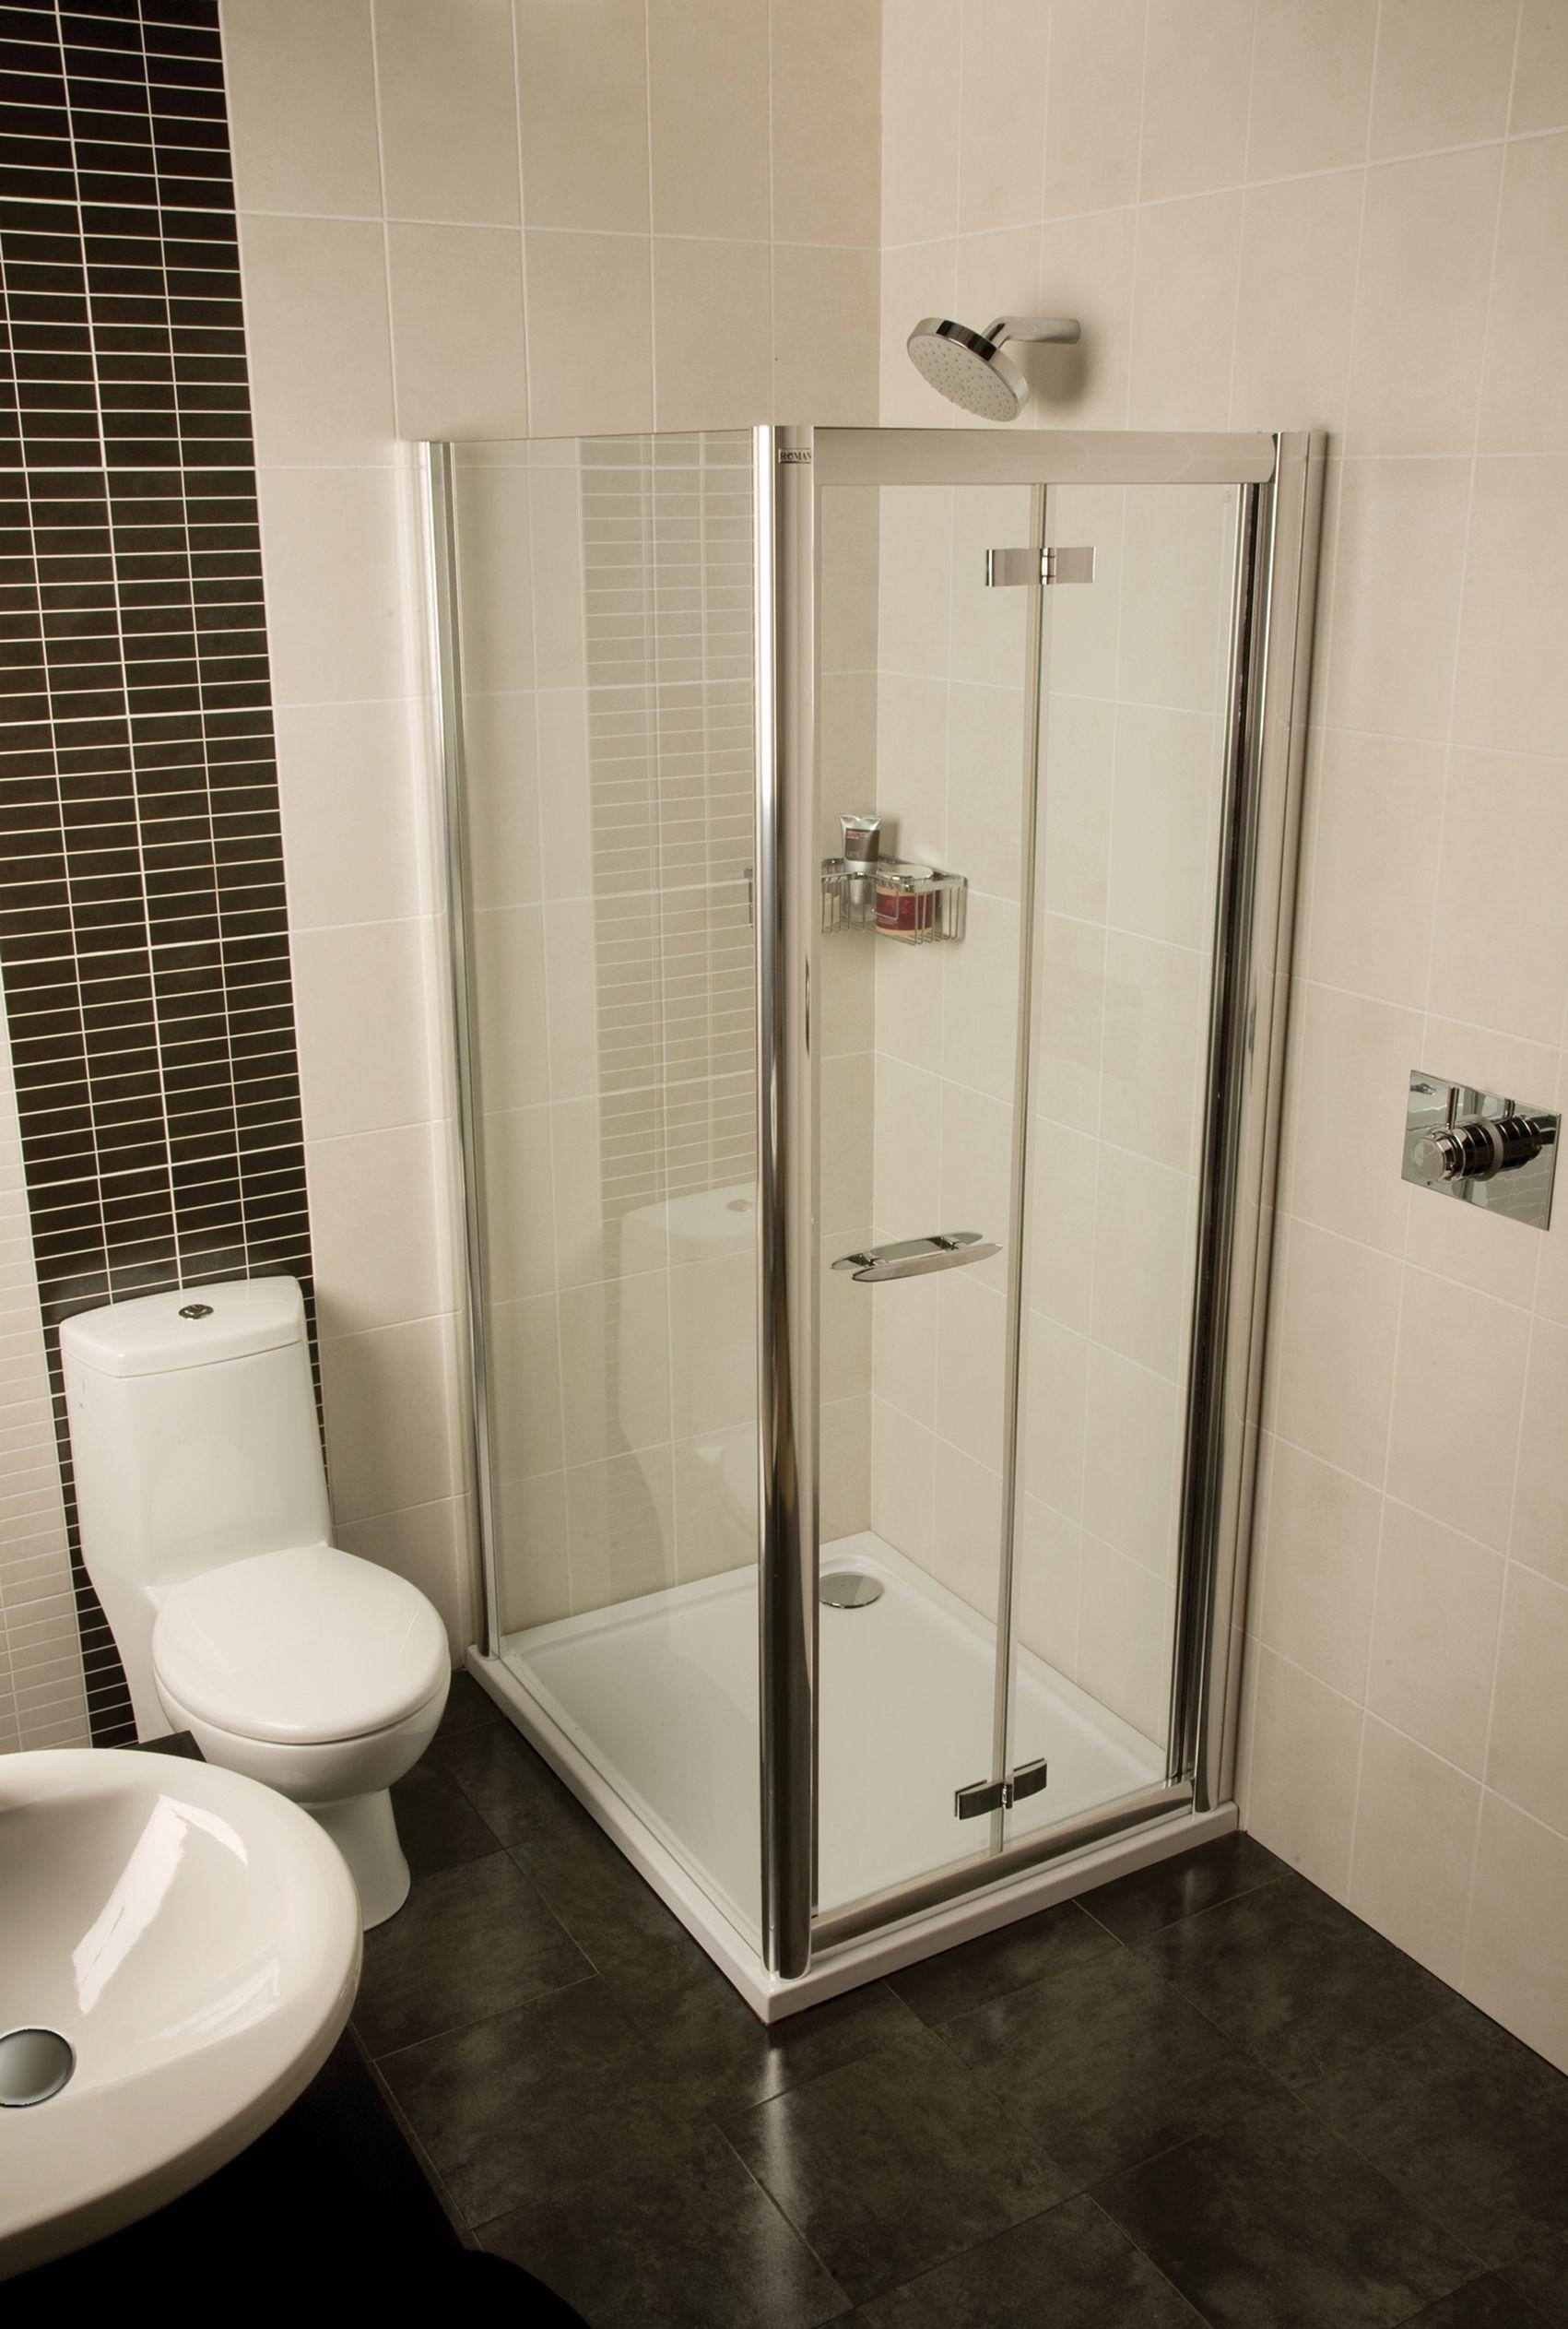 13 Fantastic Small Bathroom Design With Shower Ideas Shower